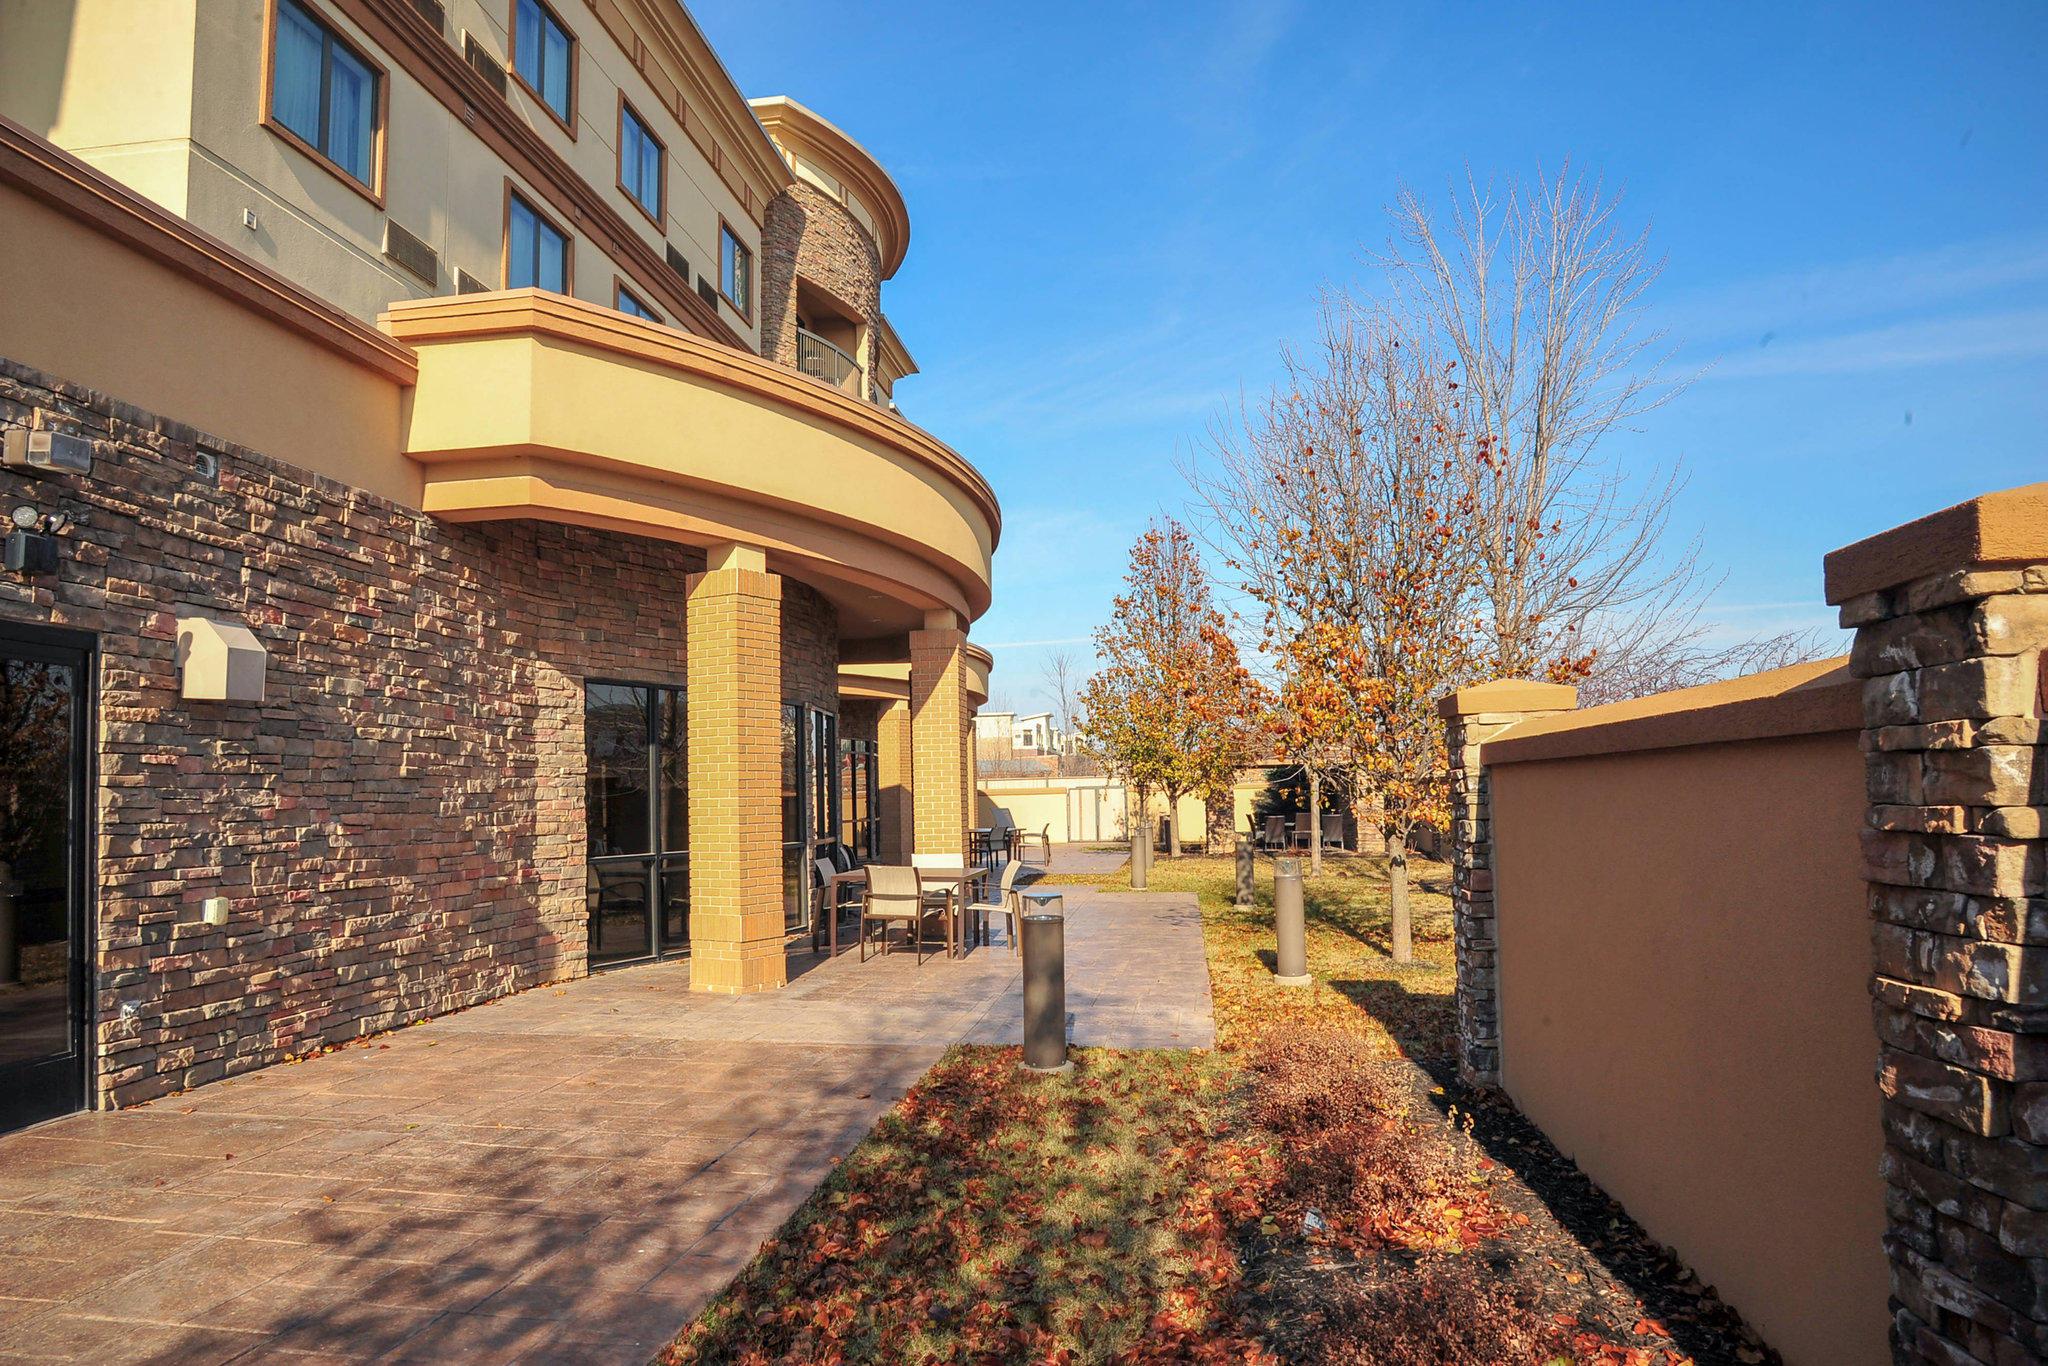 Courtyard by Marriott Des Moines West/Jordan Creek